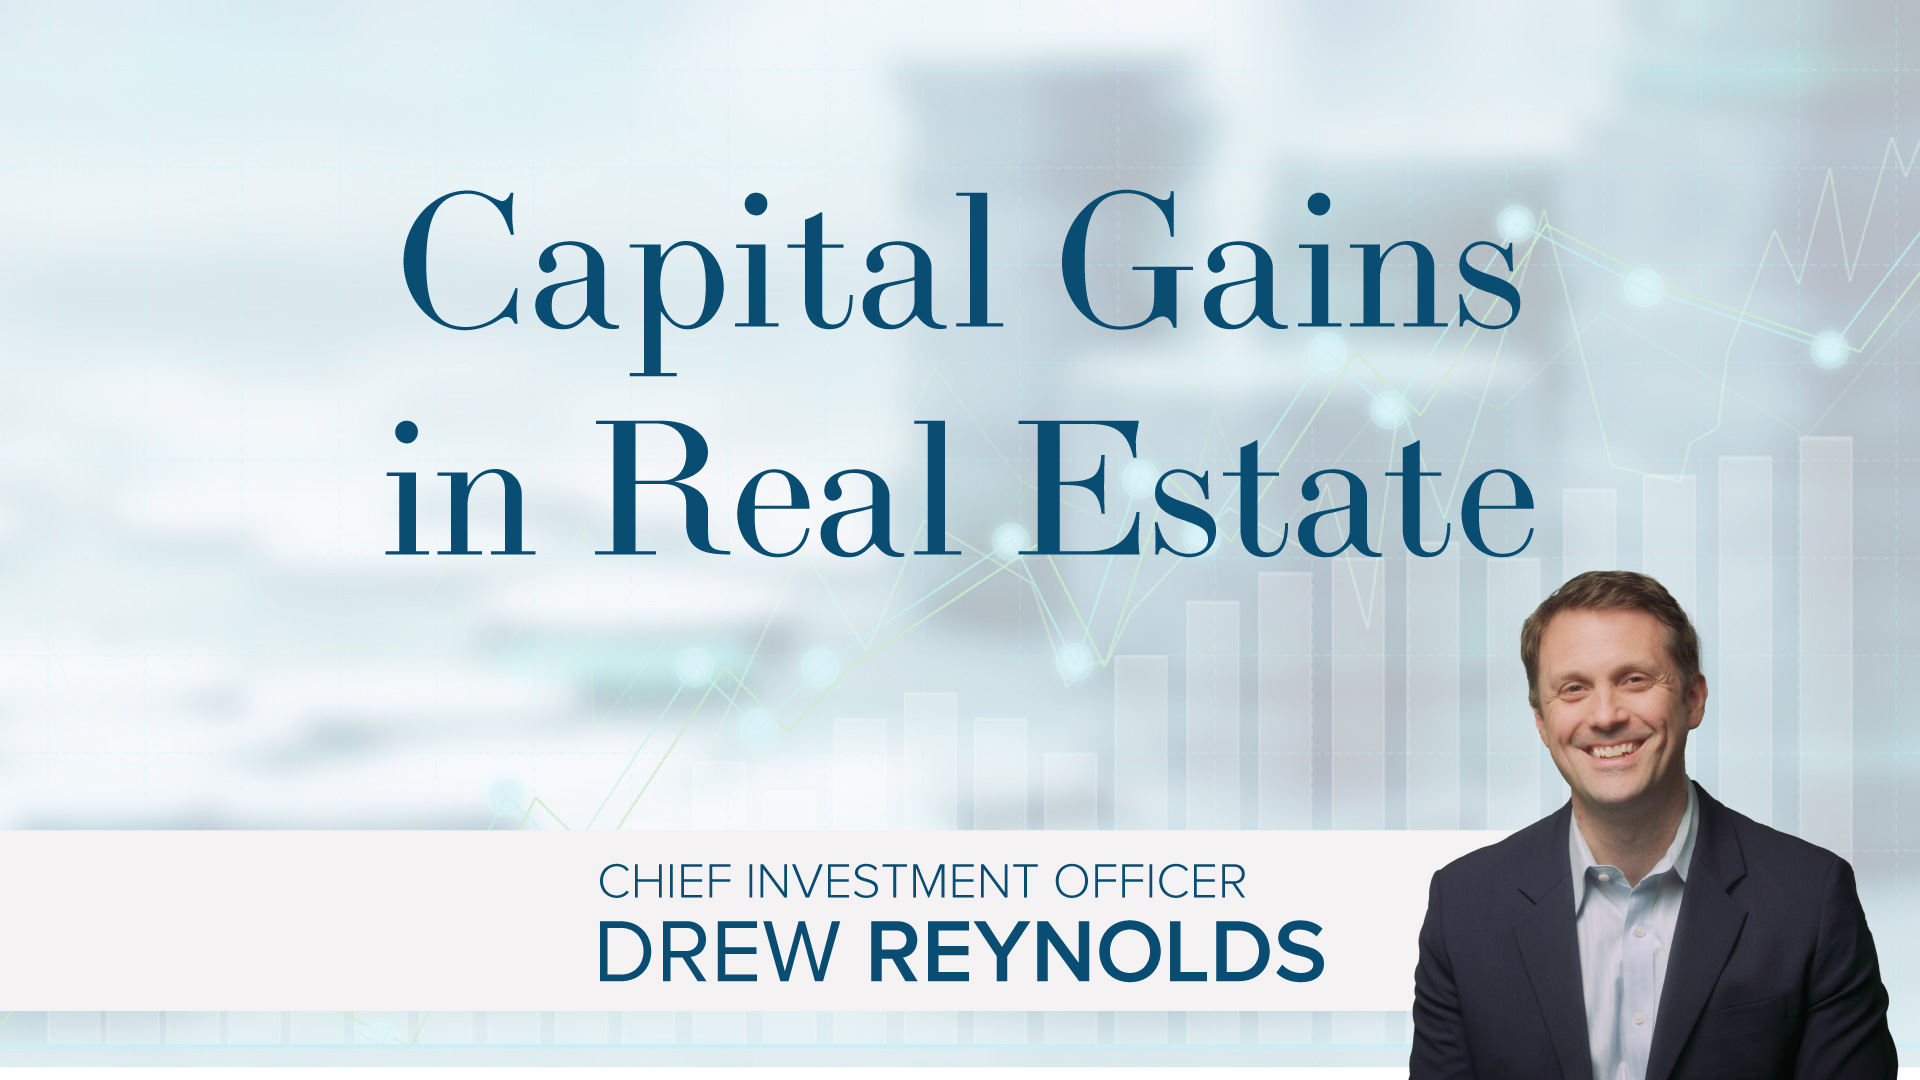 01 Capital Gains